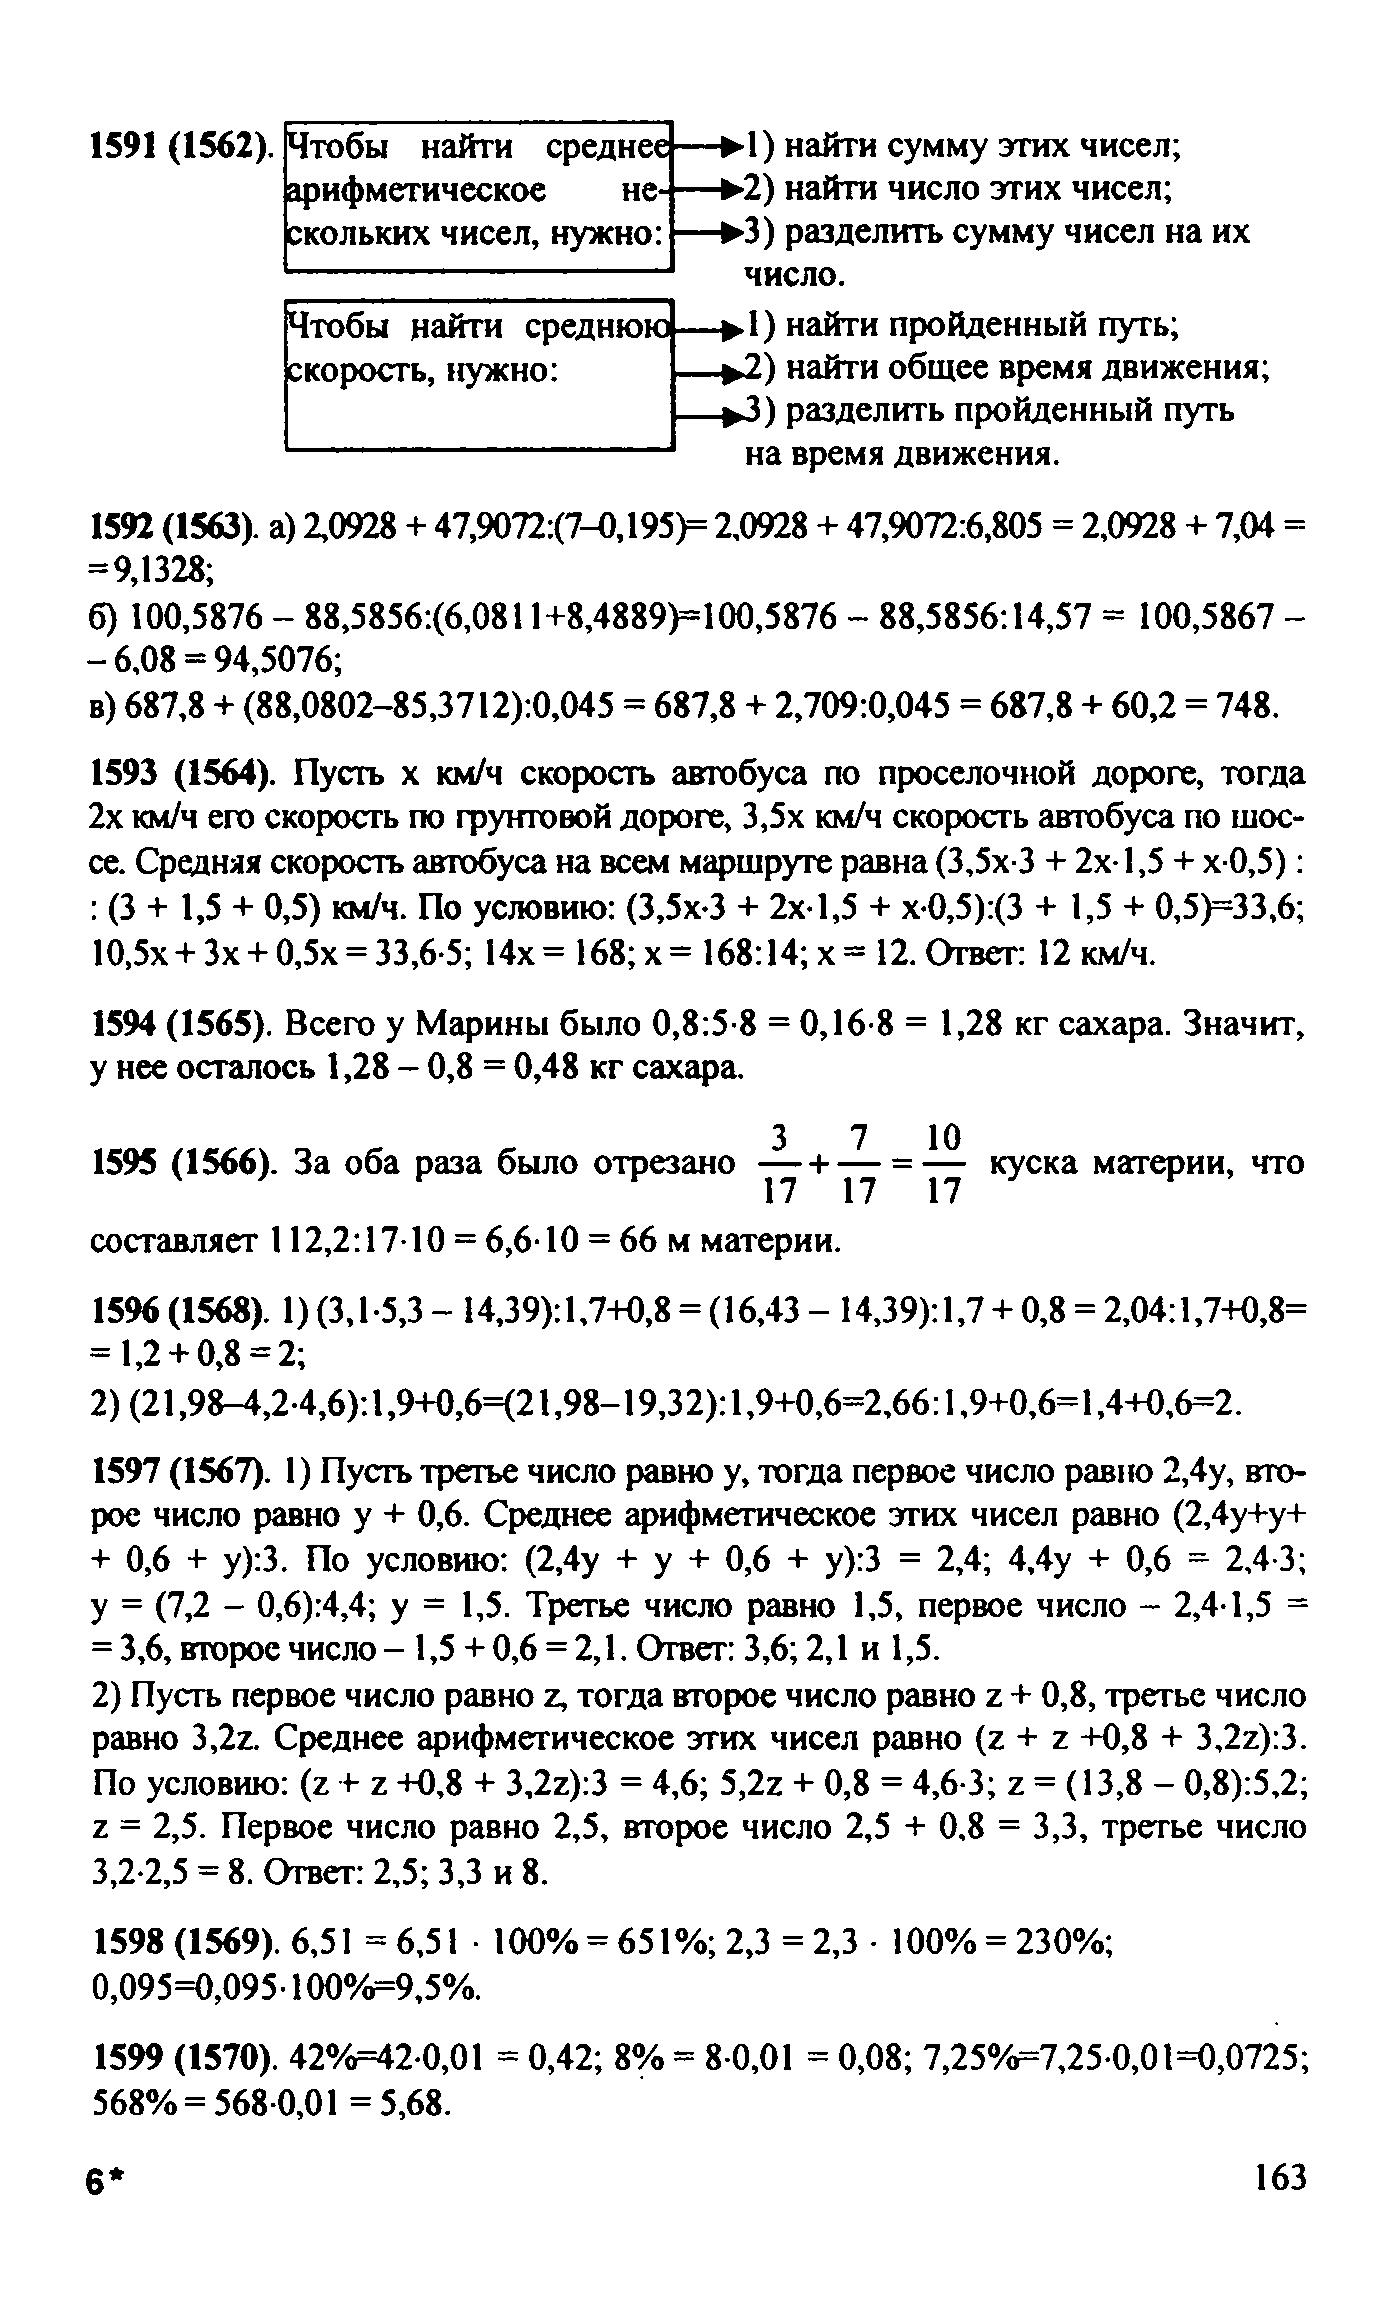 Решебник По Математике 5 Класс Виленкин 2004